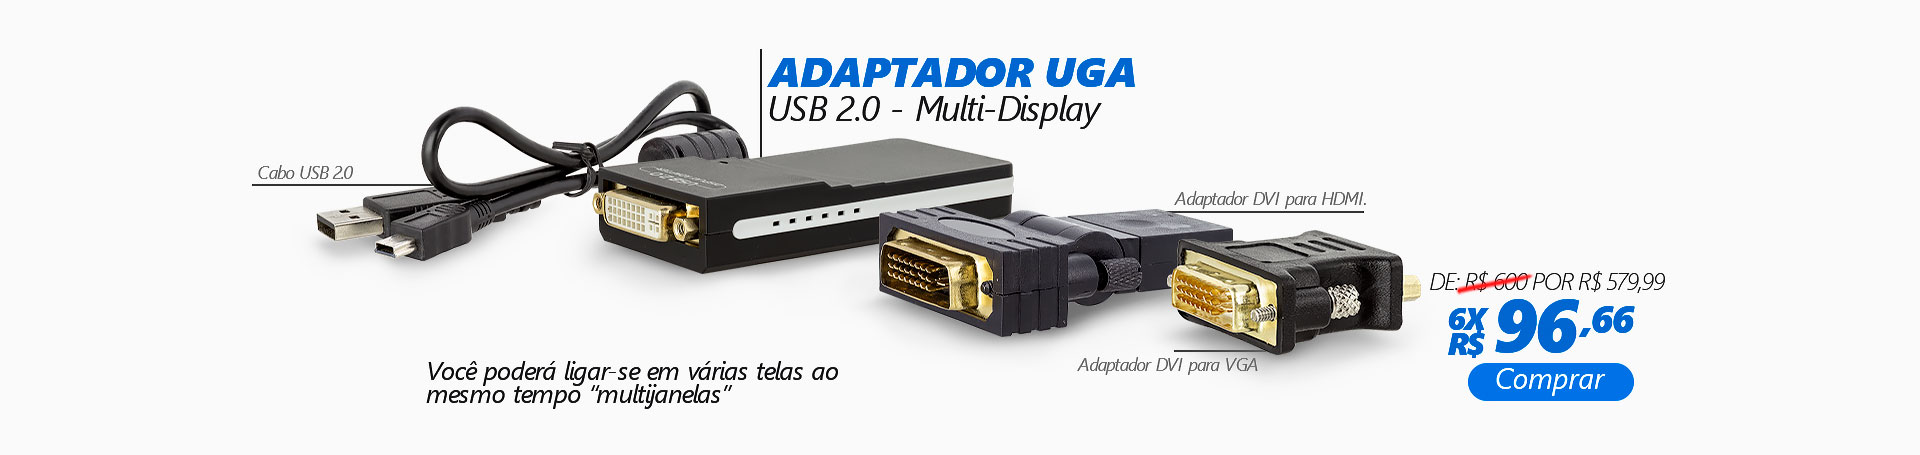 Adaptador USB UGA